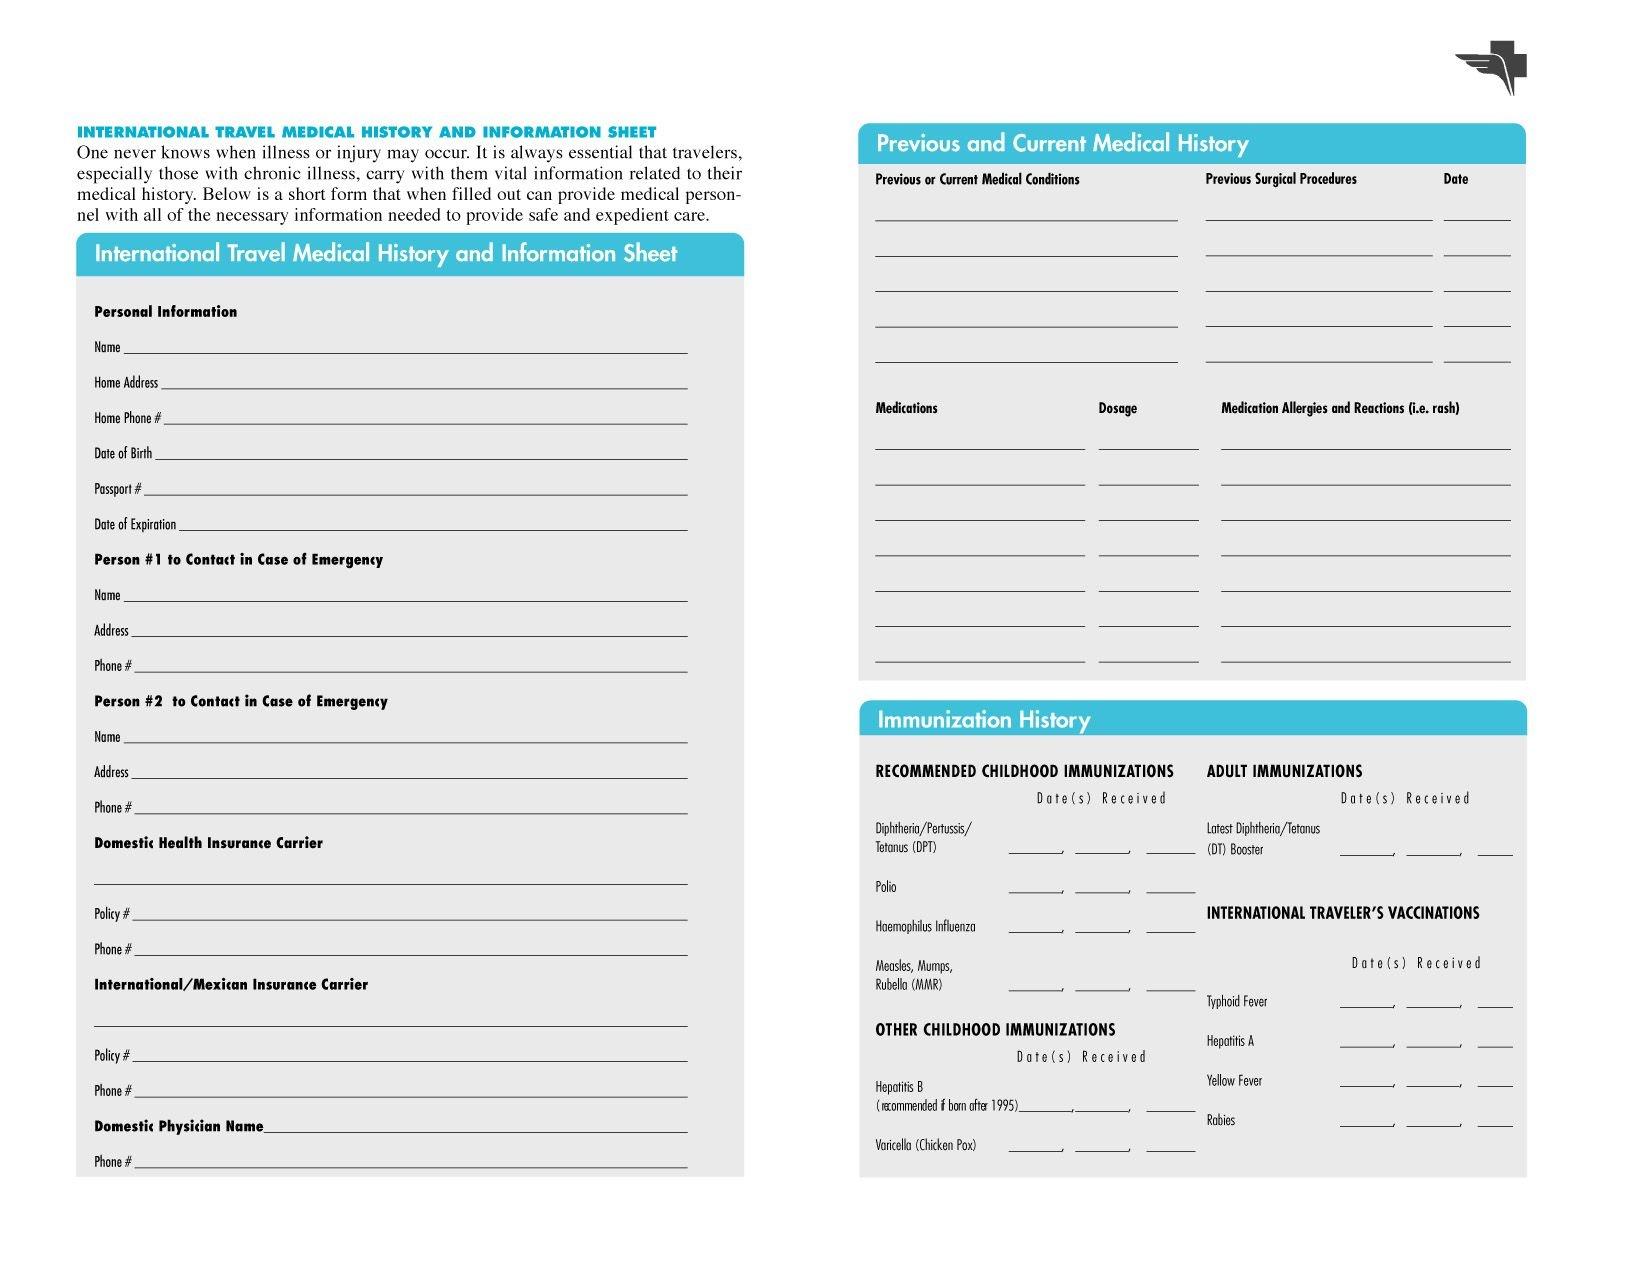 Free Printables | Free Printable Family Medical History Forms - Free Printable Forms